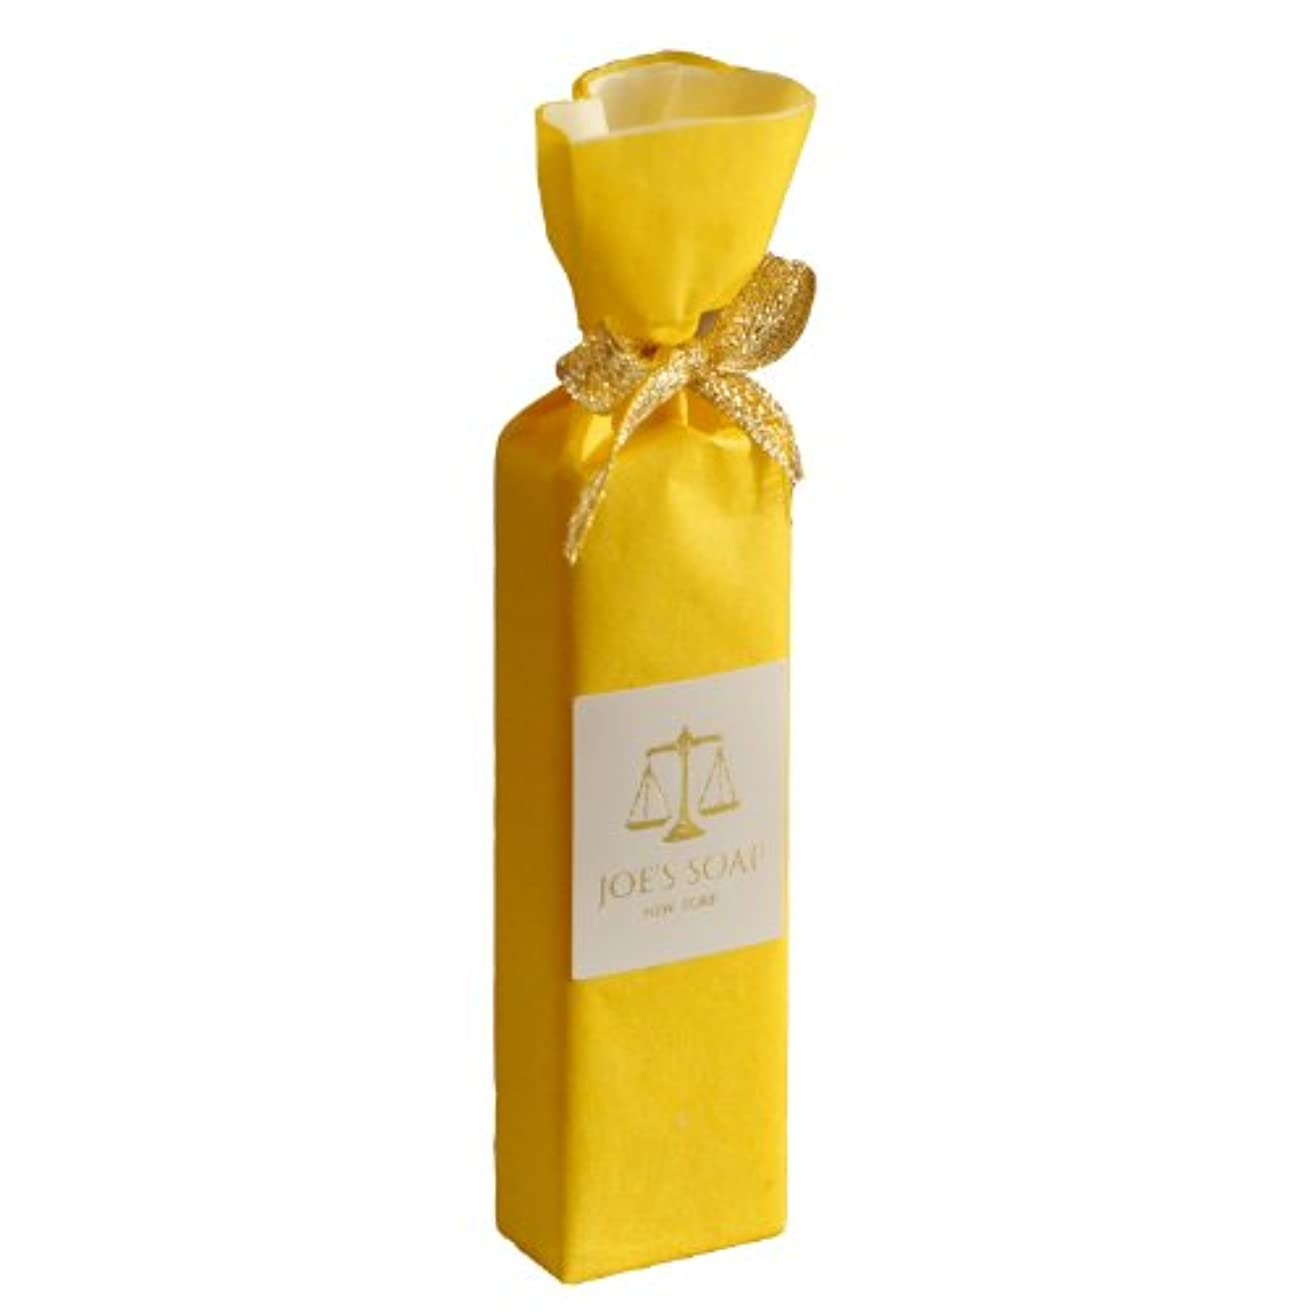 JOE'S SOAP ジョーズソープ オリーブソープ NO.6 CHAMOMILE カモミール 20g トライアル お試し無添加 オーガニック 石鹸 洗顔 保湿